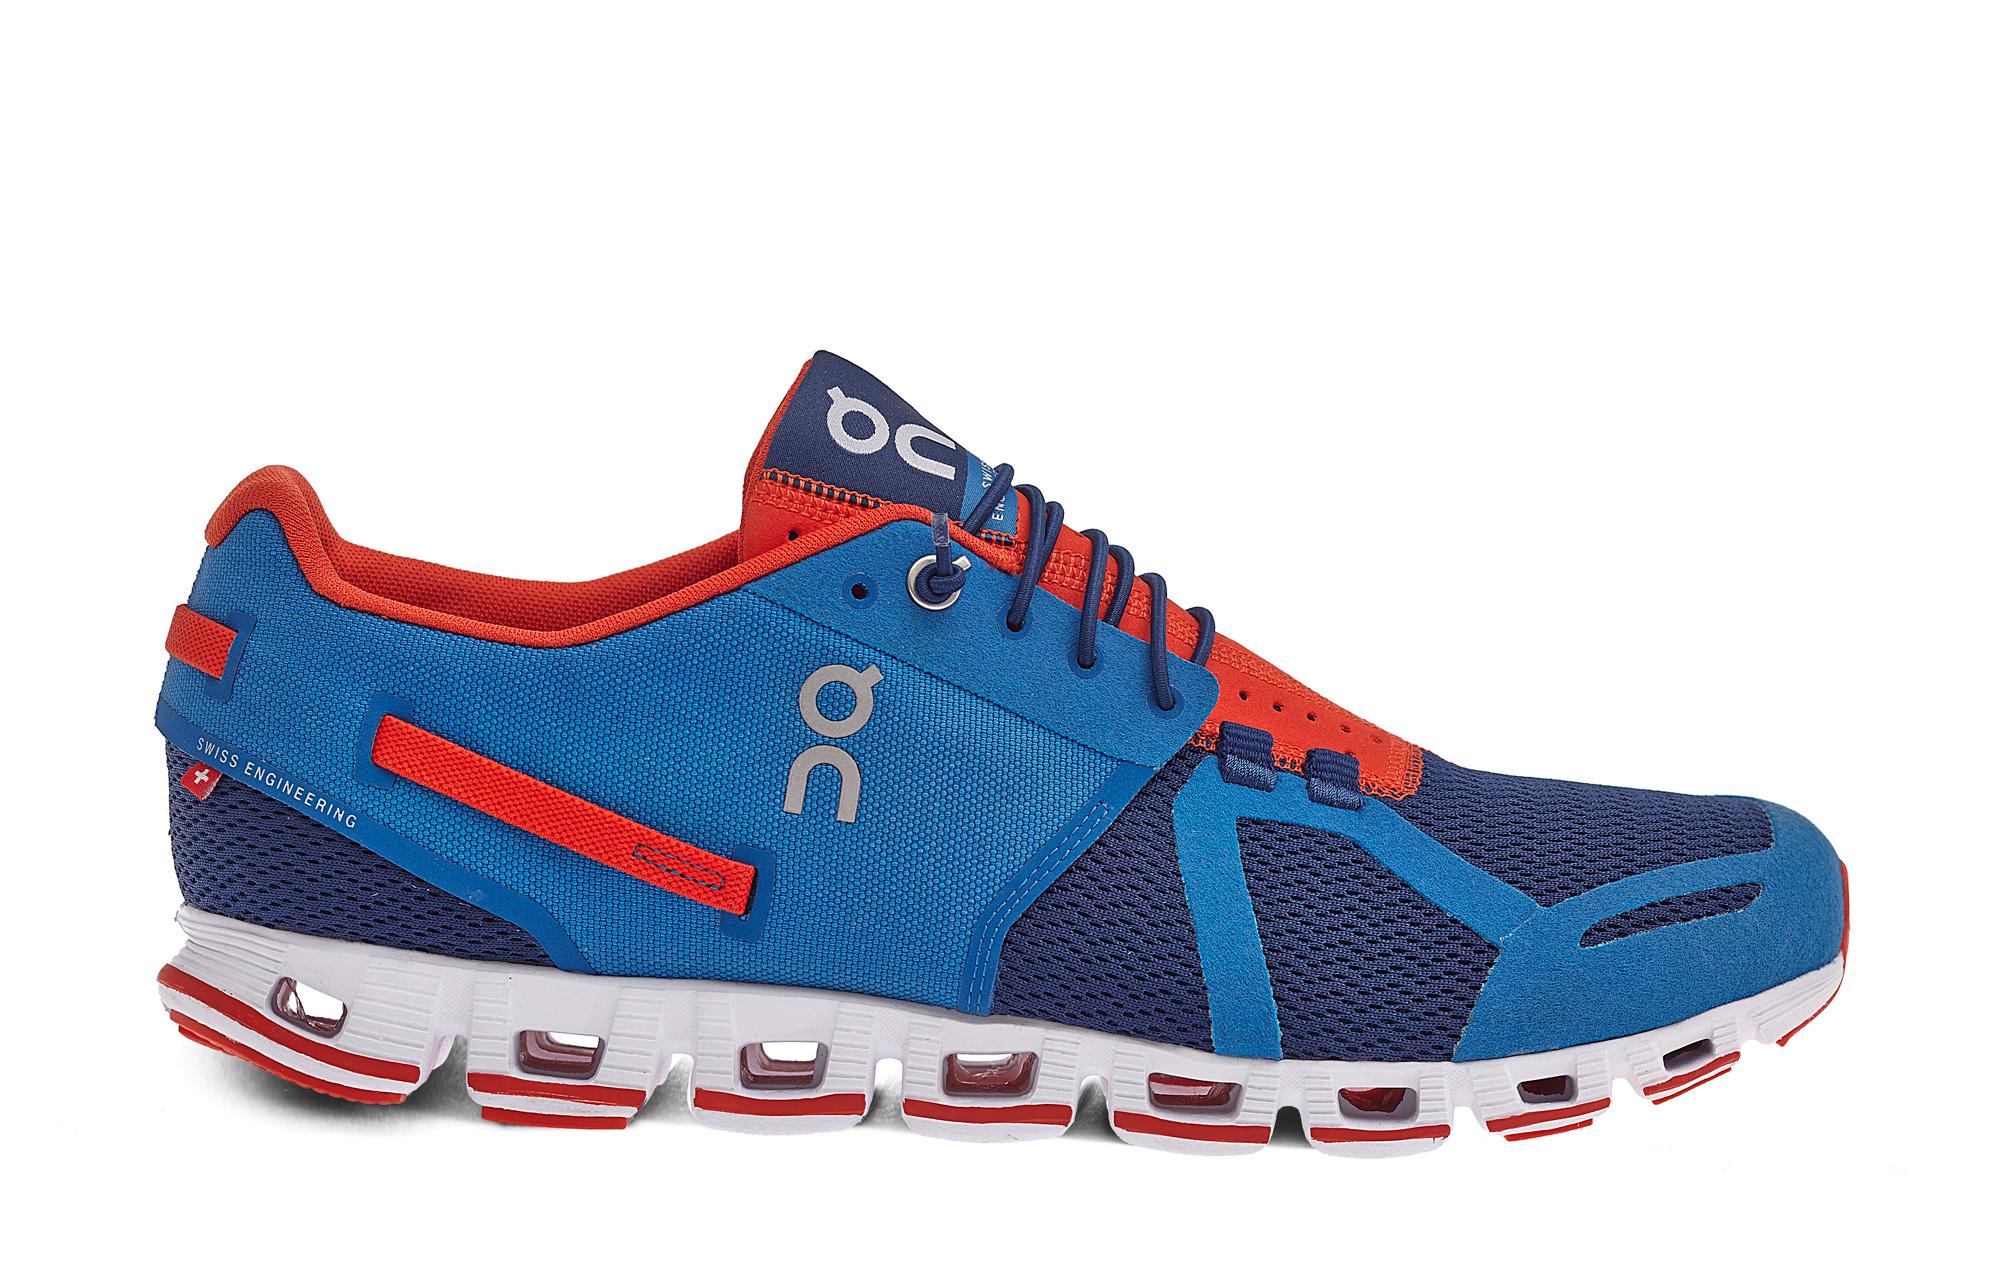 On Cloud - Blue/Orange Running Shoes